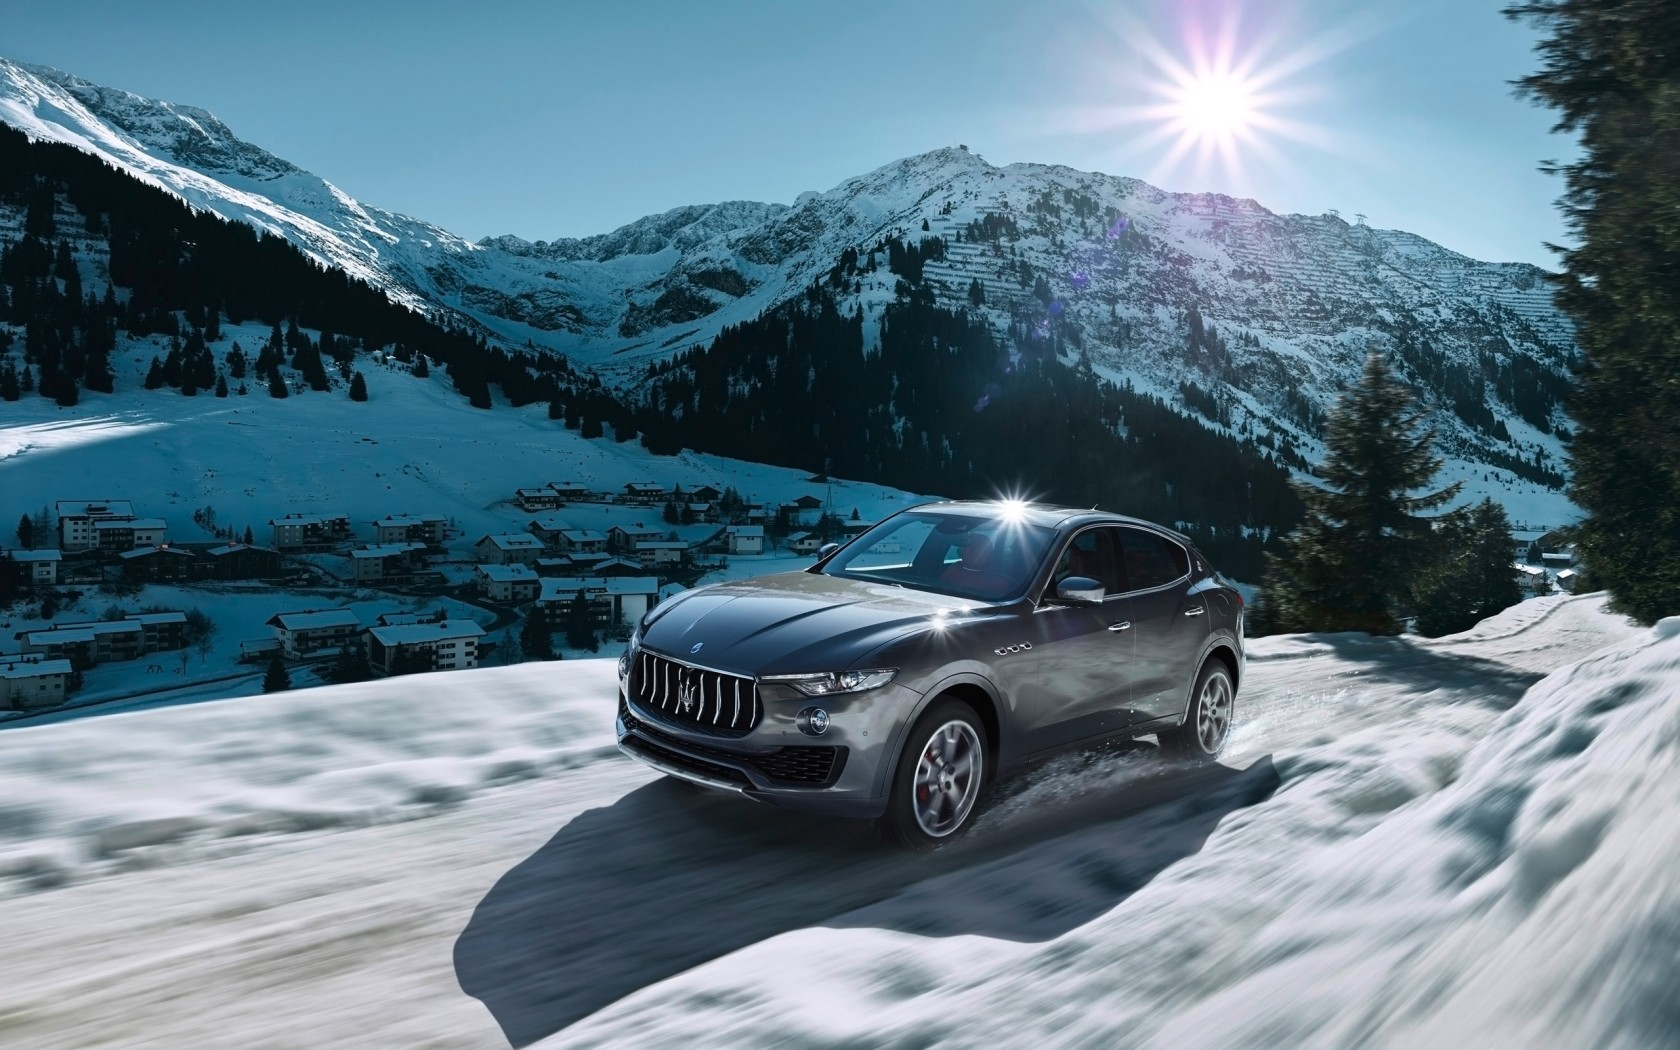 2016 Maserati Levante Wallpaper | HD Car Wallpapers | ID #6208